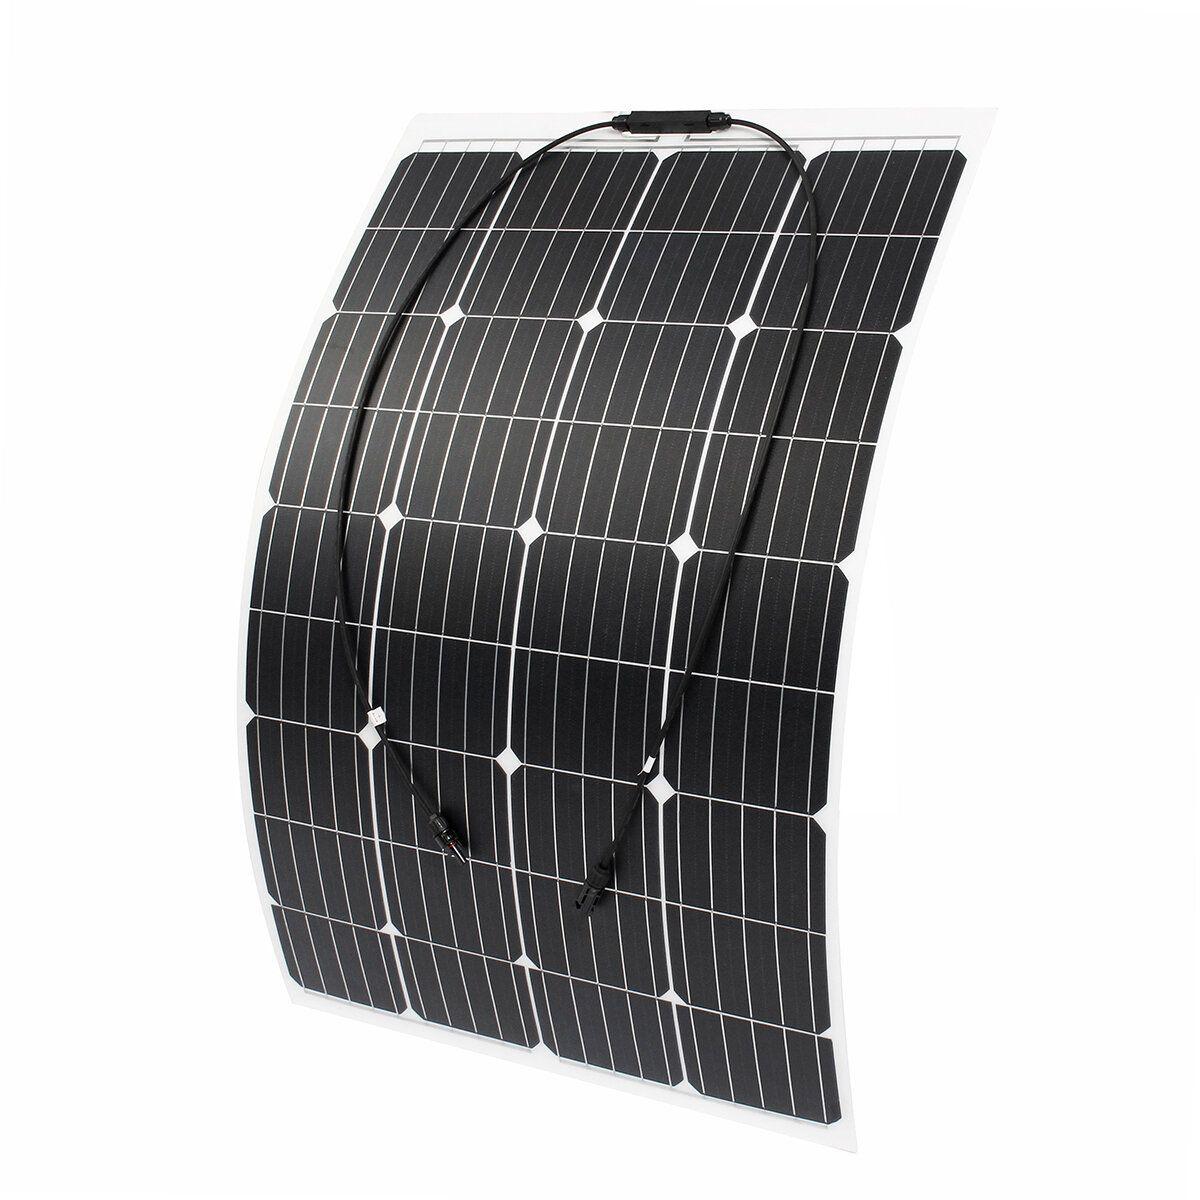 120W 18V Monocrystalline Silicon Semi flexible Solar Panel Battery Charger W/ MC4 Connector